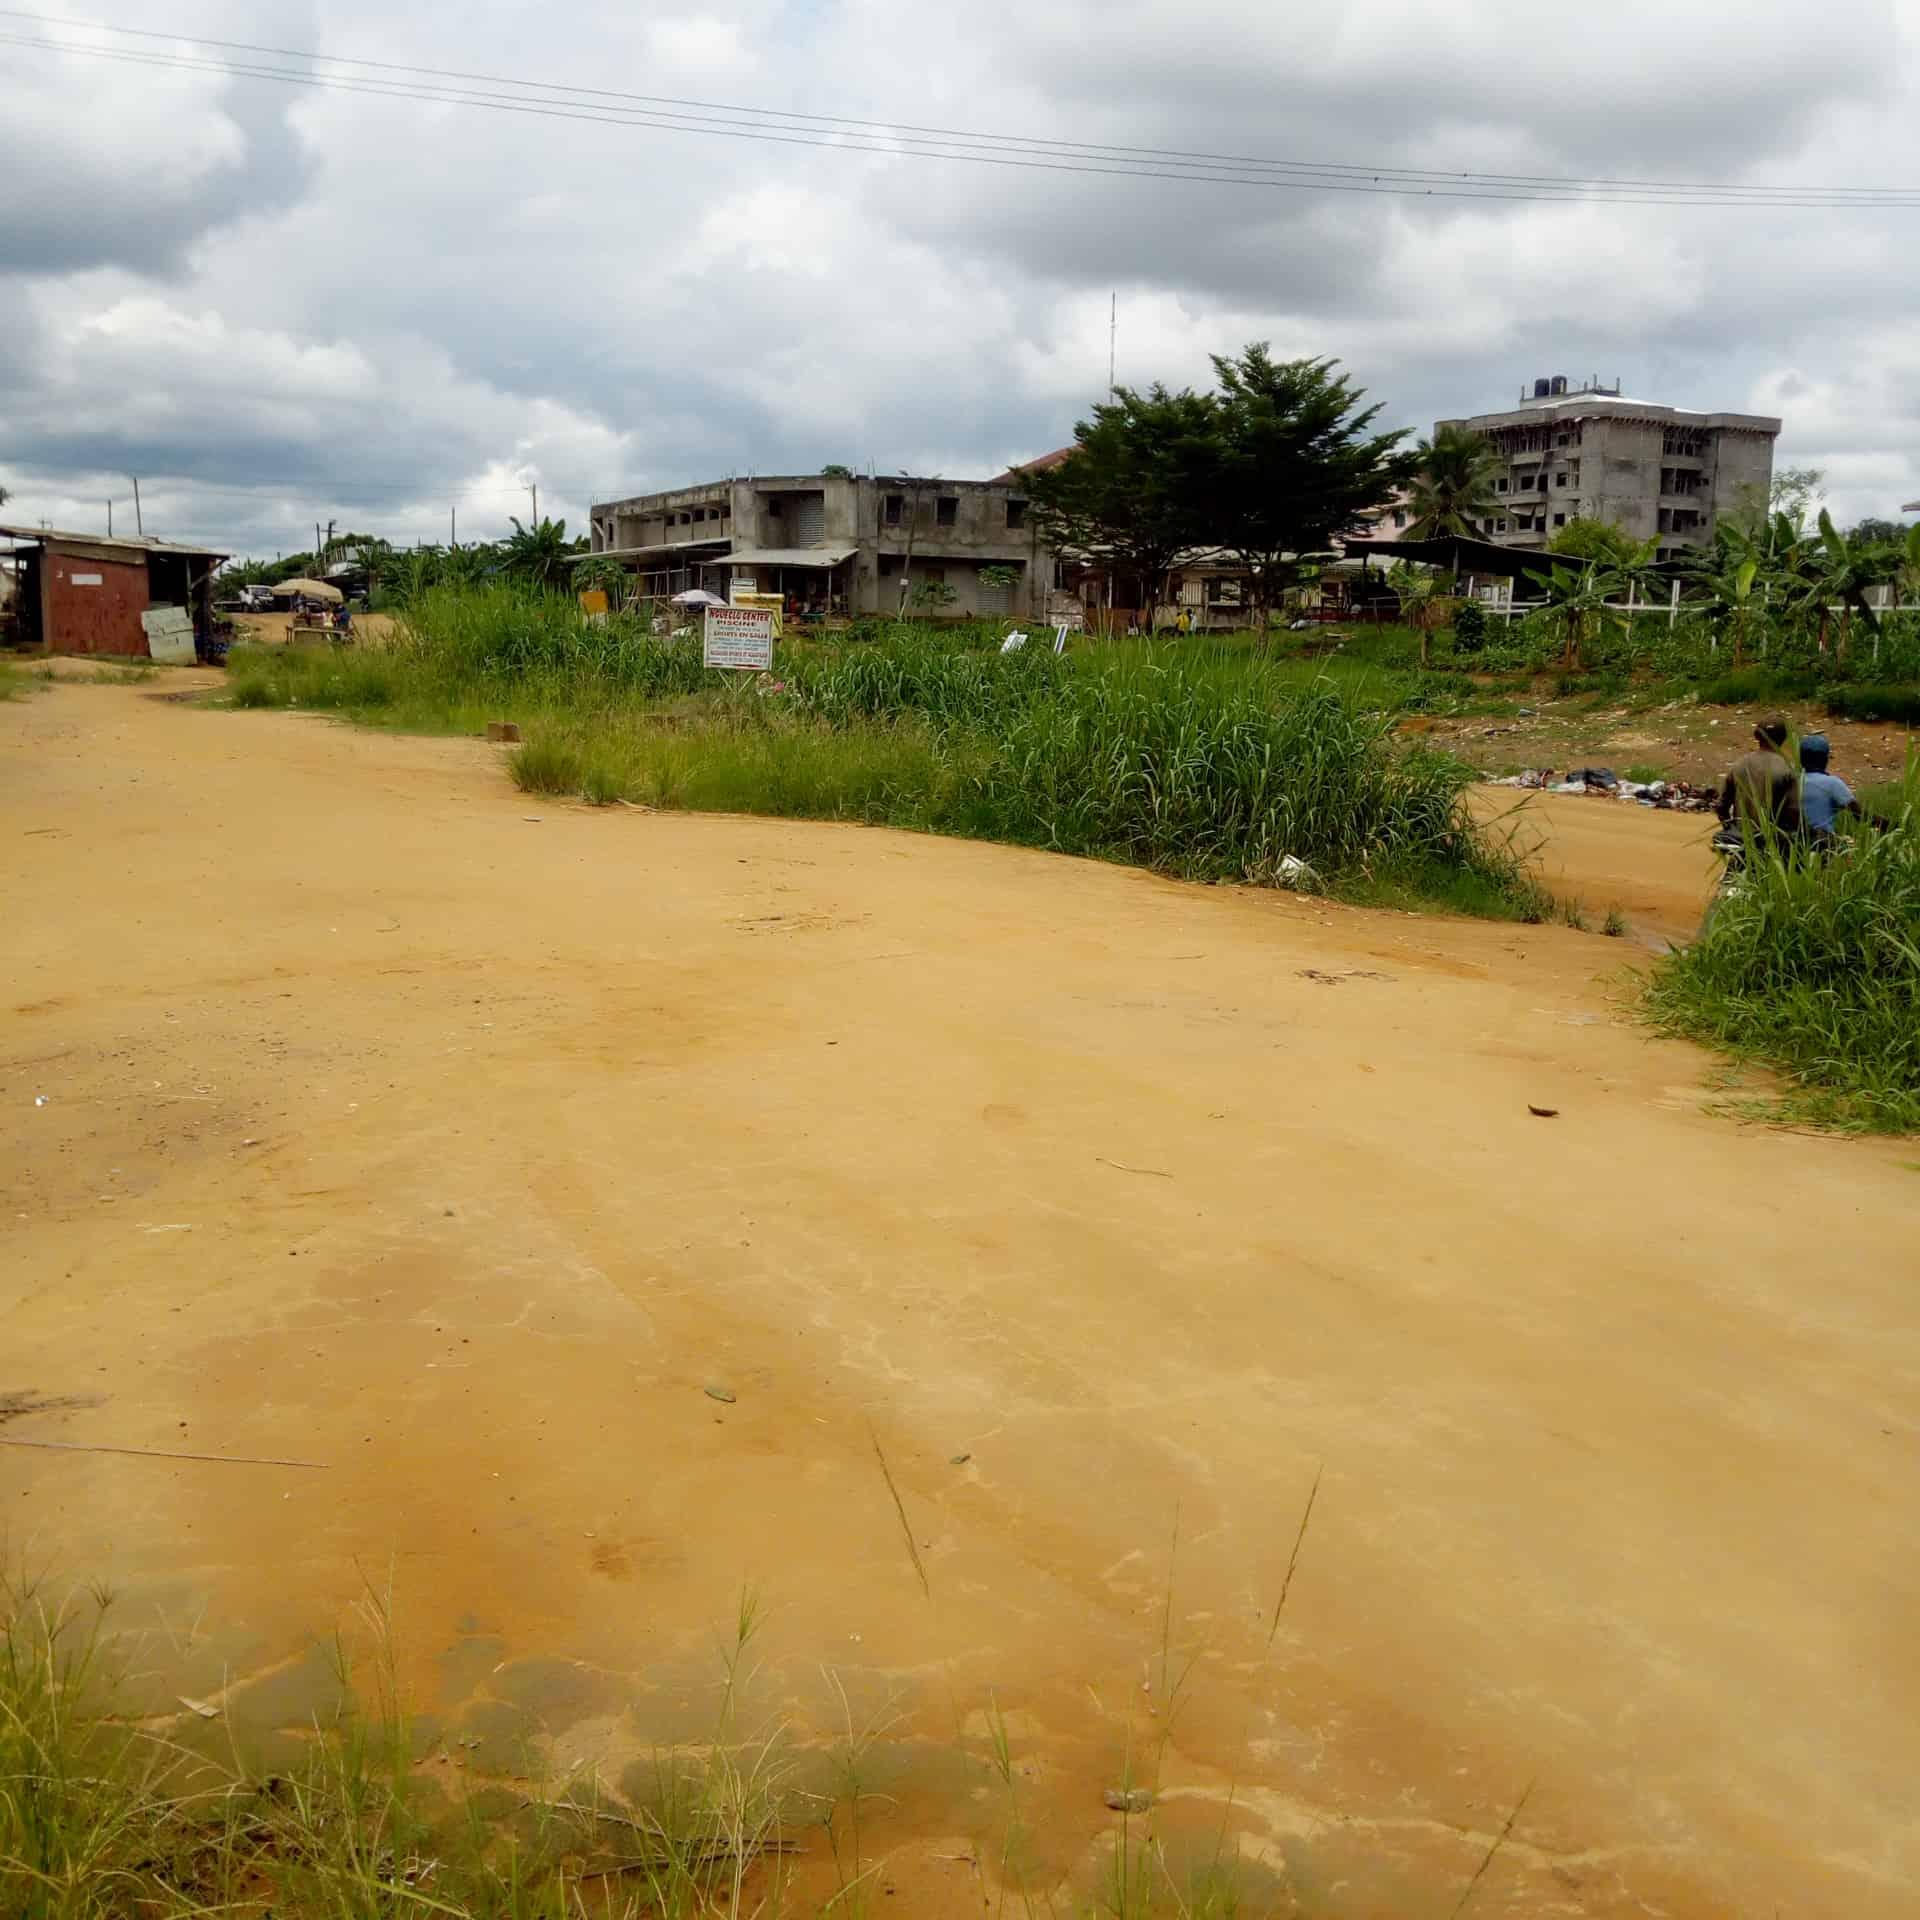 Land for sale at Douala, Logbessou I, Antenne CRTV - 500 m2 - 60 000 000 FCFA